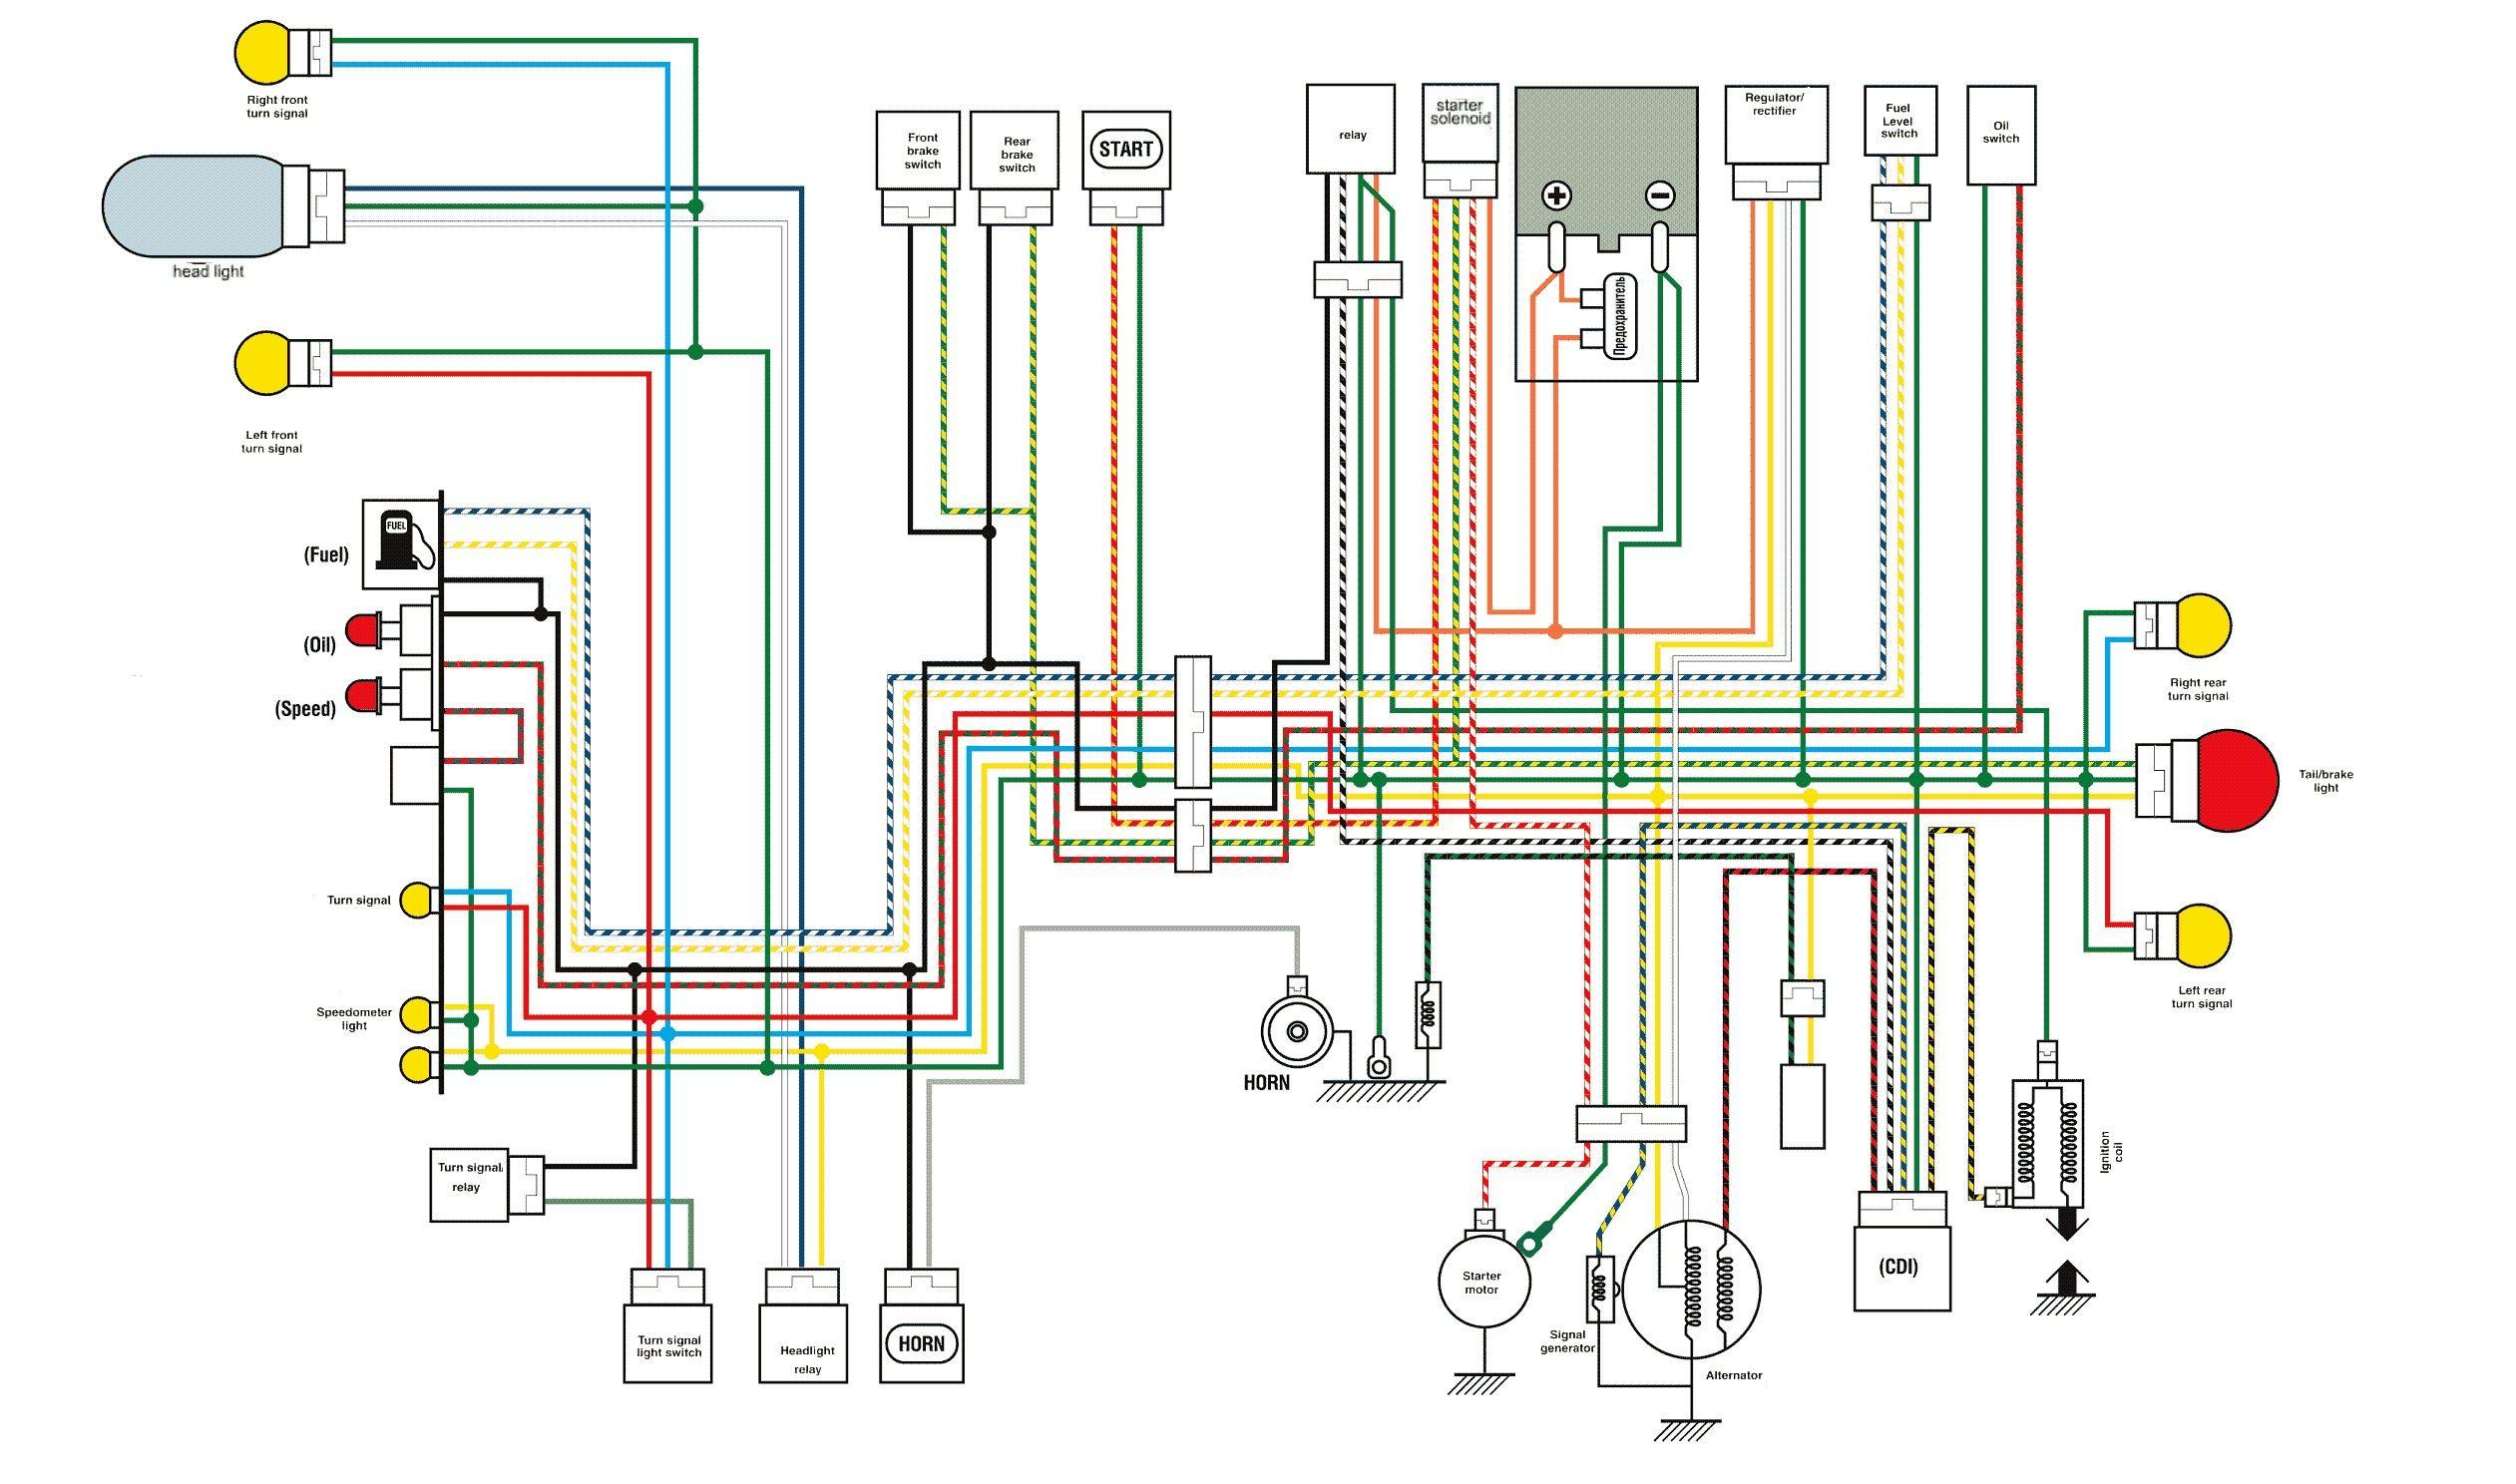 12 Good Wiring Diagram Of Motorcycle Honda Xrm 110 Technique Https Bacamajalah Com 12 Good Wi Electrical Wiring Diagram Motorcycle Wiring Electrical Wiring